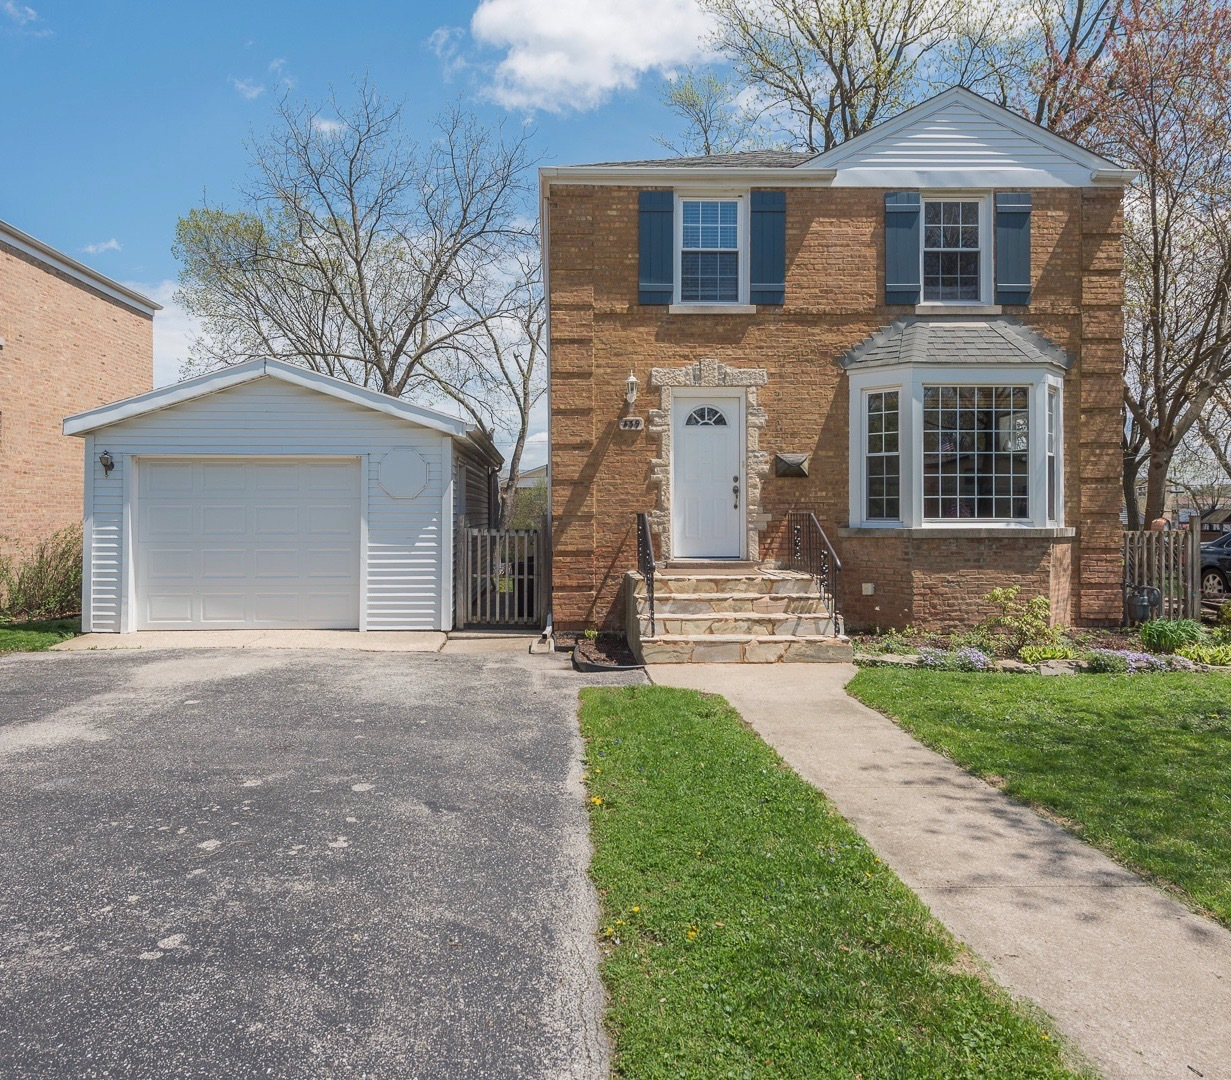 439 N Princeton Ave, Villa Park, IL 60181